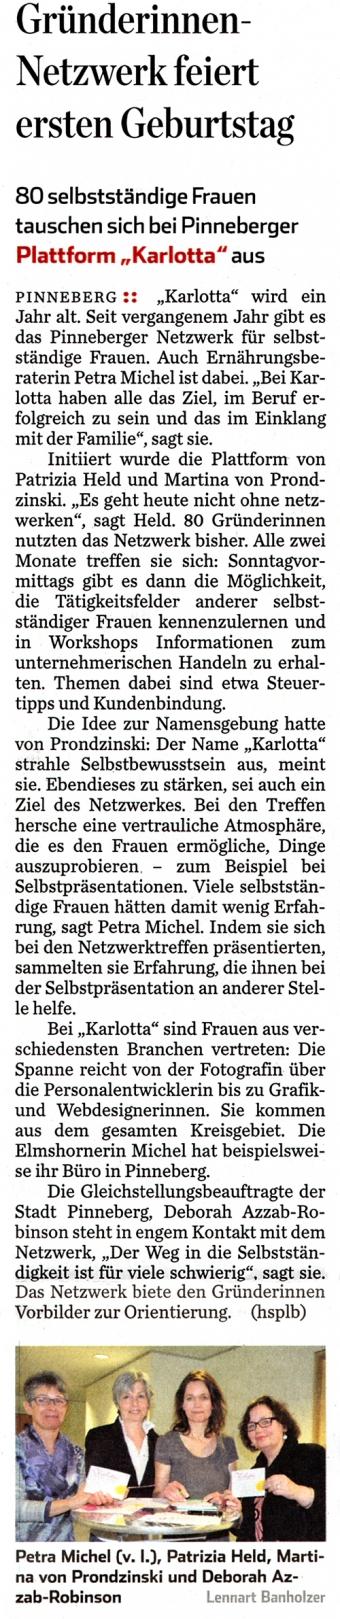 Hamburger_Abendblatt_14.4.2015